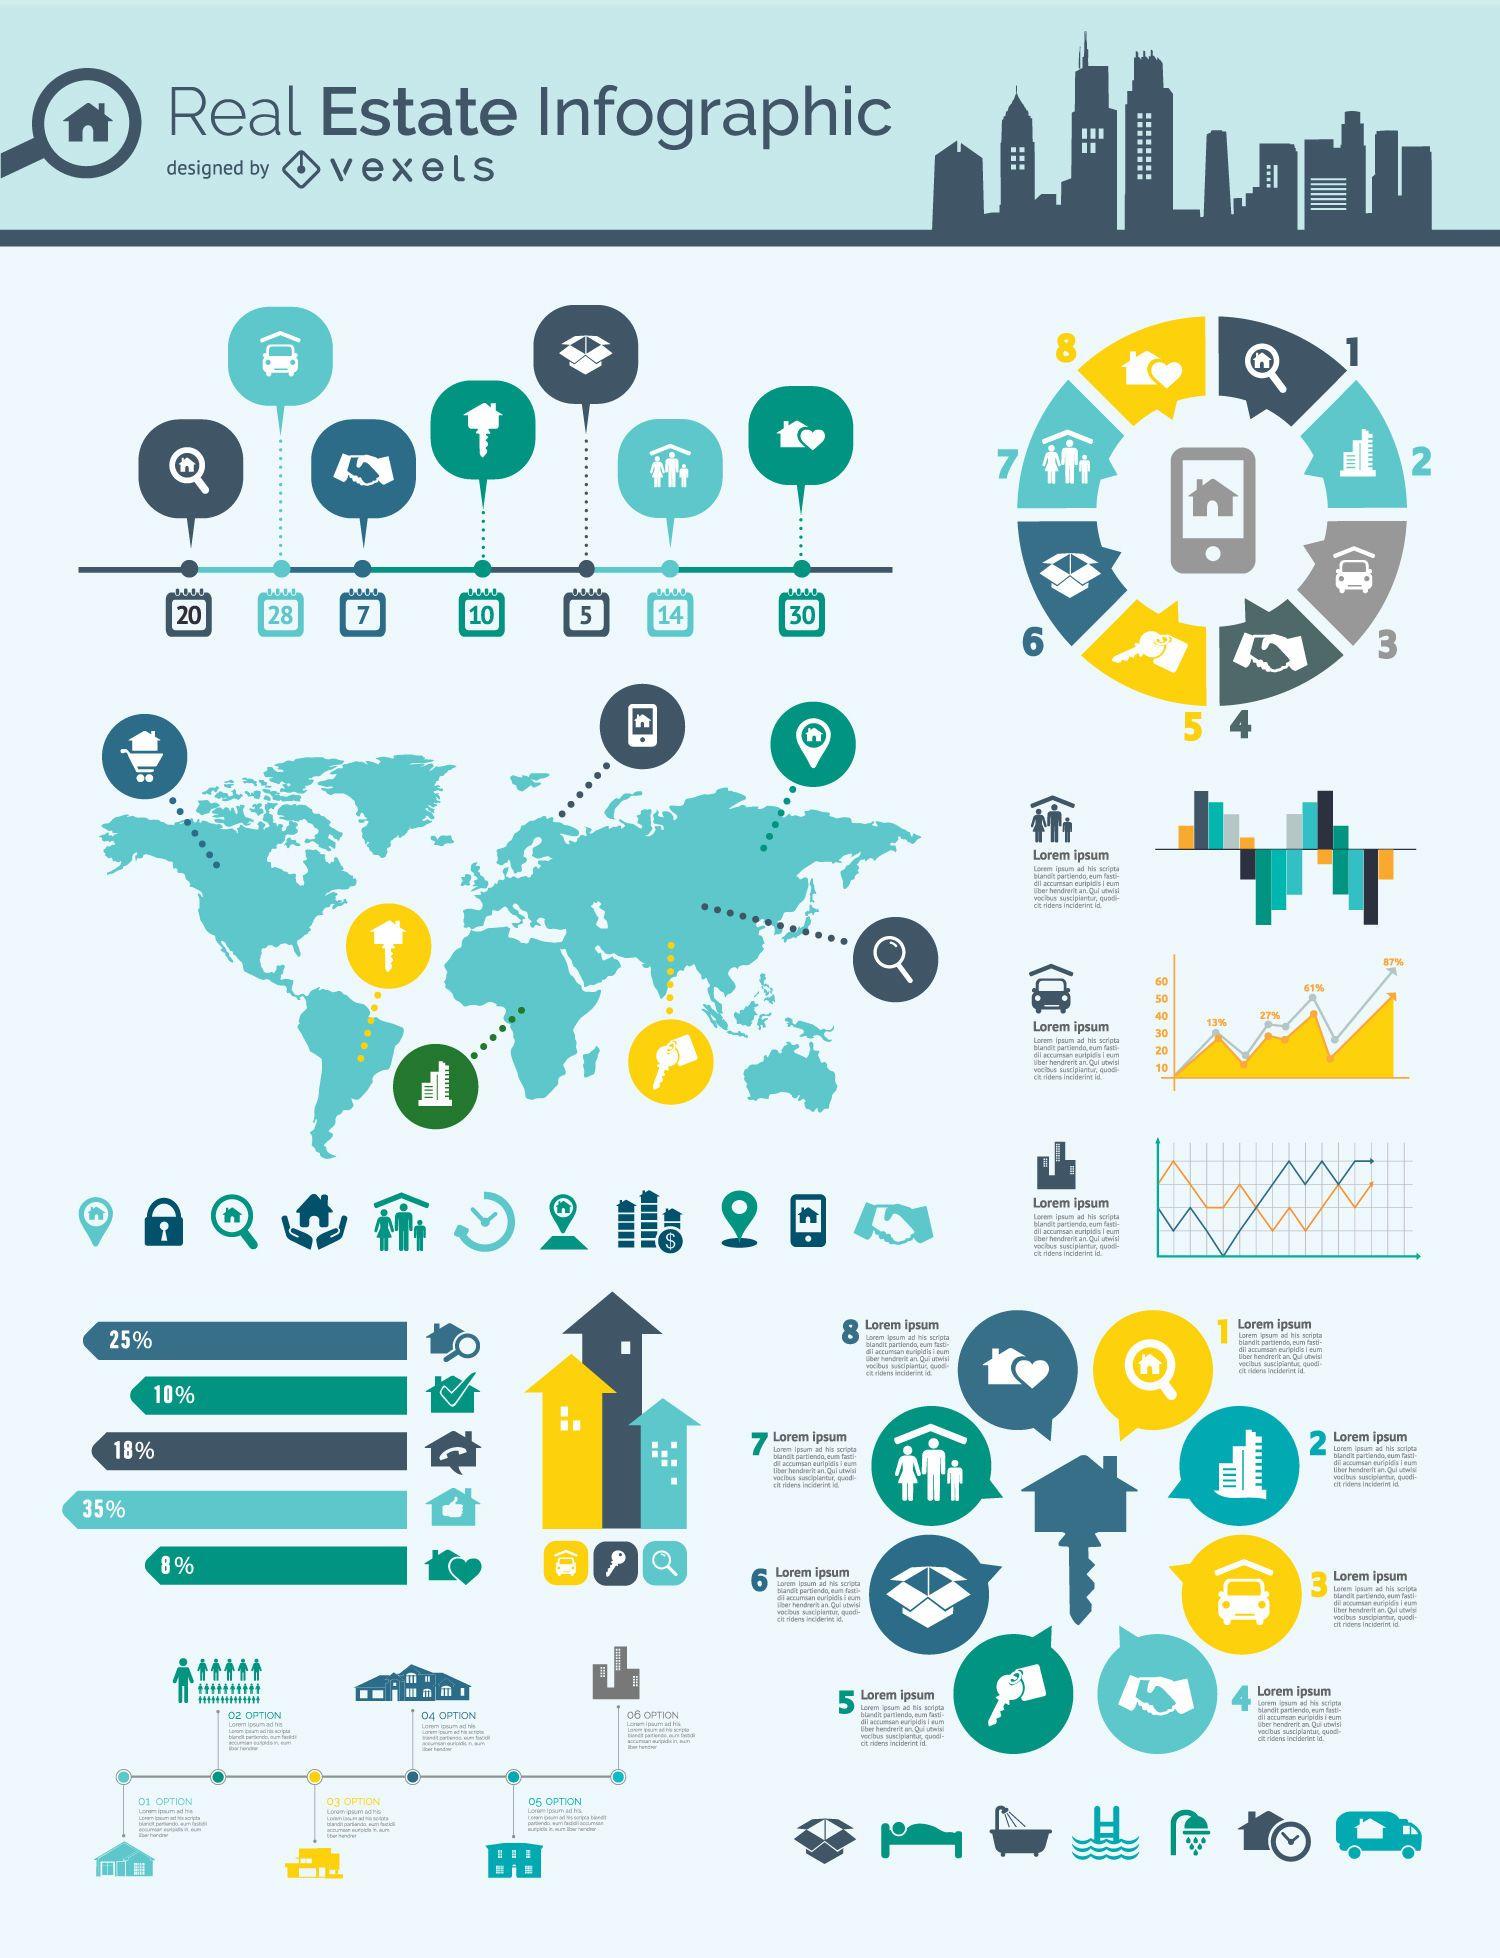 Mapa mental de infografía inmobiliaria